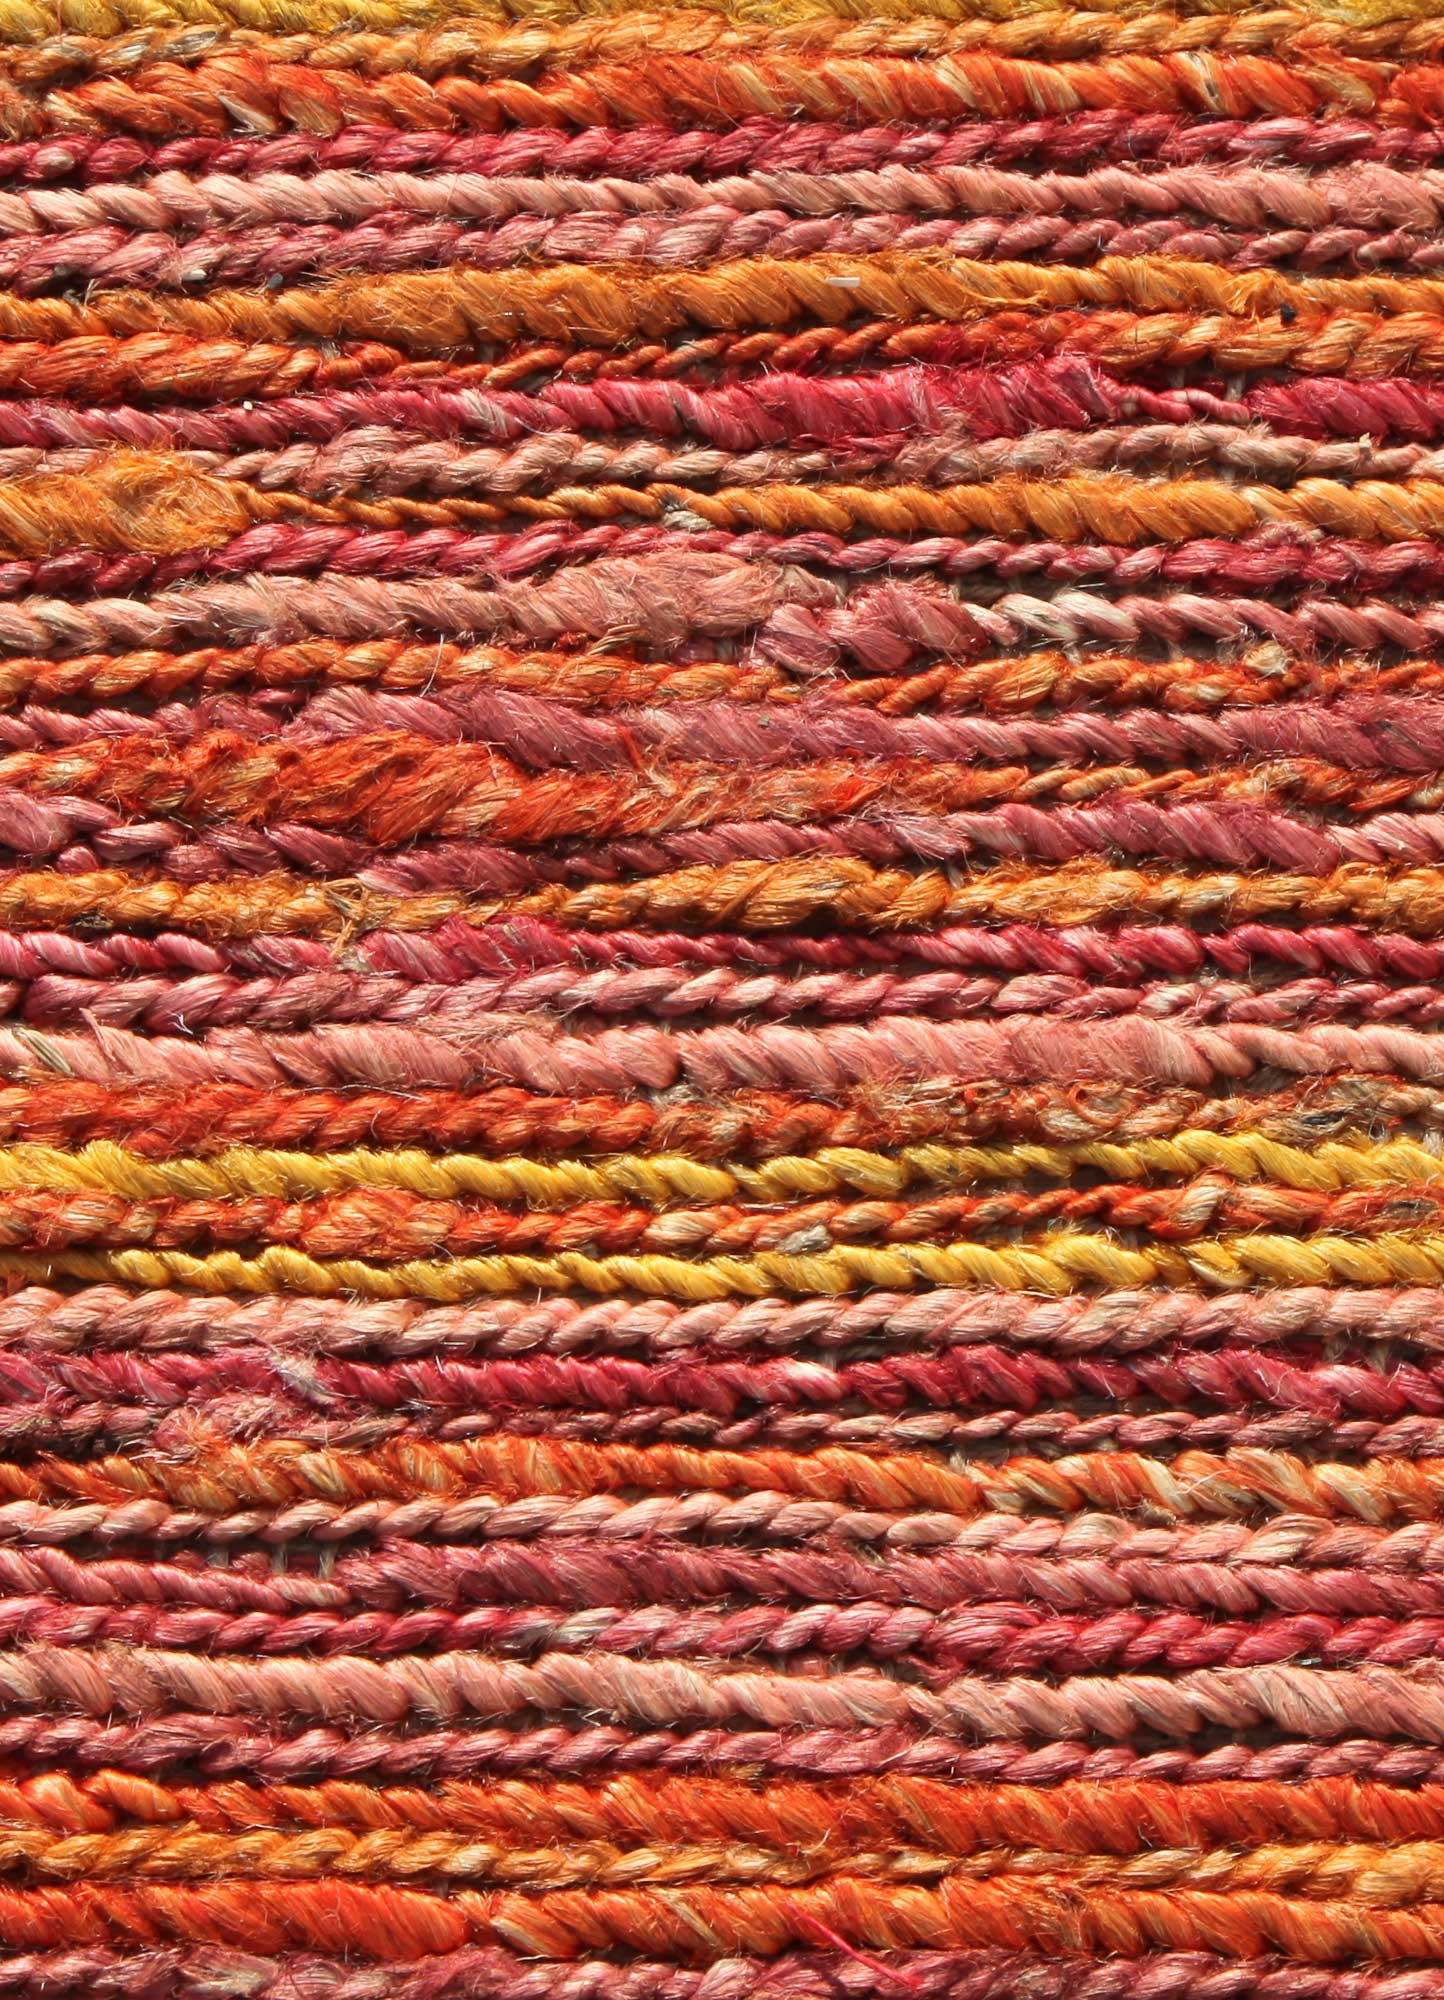 abrash red and orange jute and hemp jute rugs Rug - CloseUp